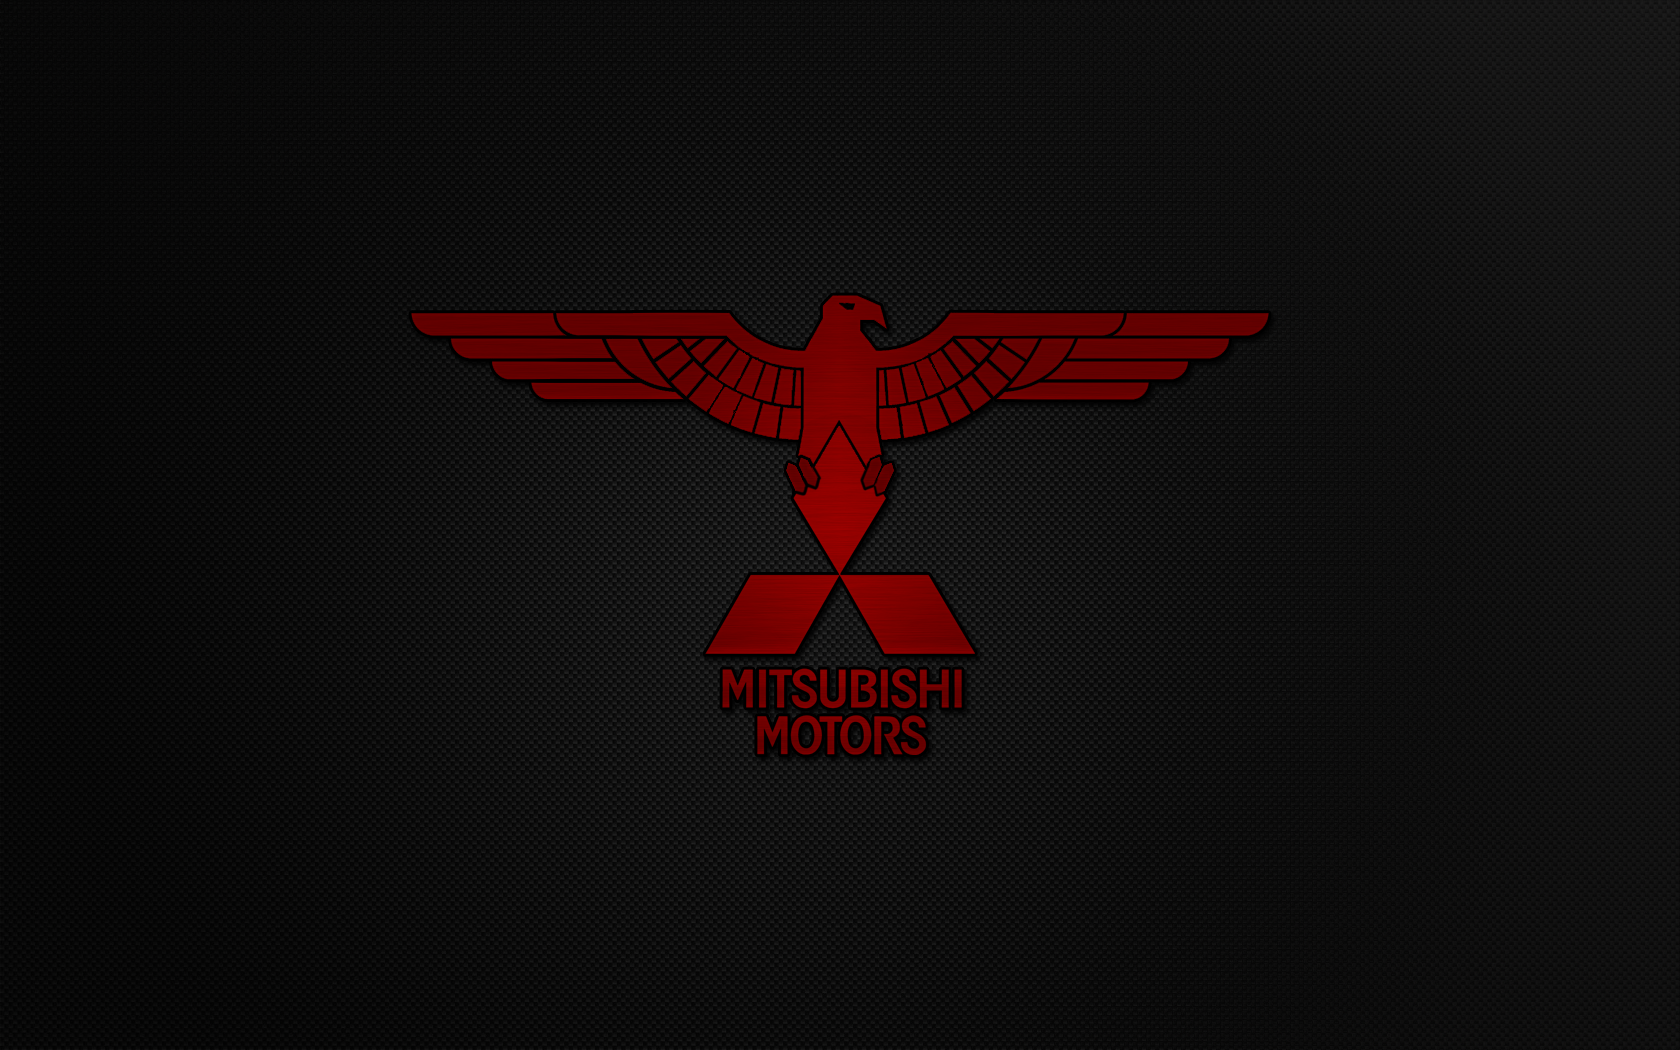 Mitsubishi Motors 3 by beside2k on DeviantArt: beside2k.deviantart.com/art/Mitsubishi-Motors-3-139506079